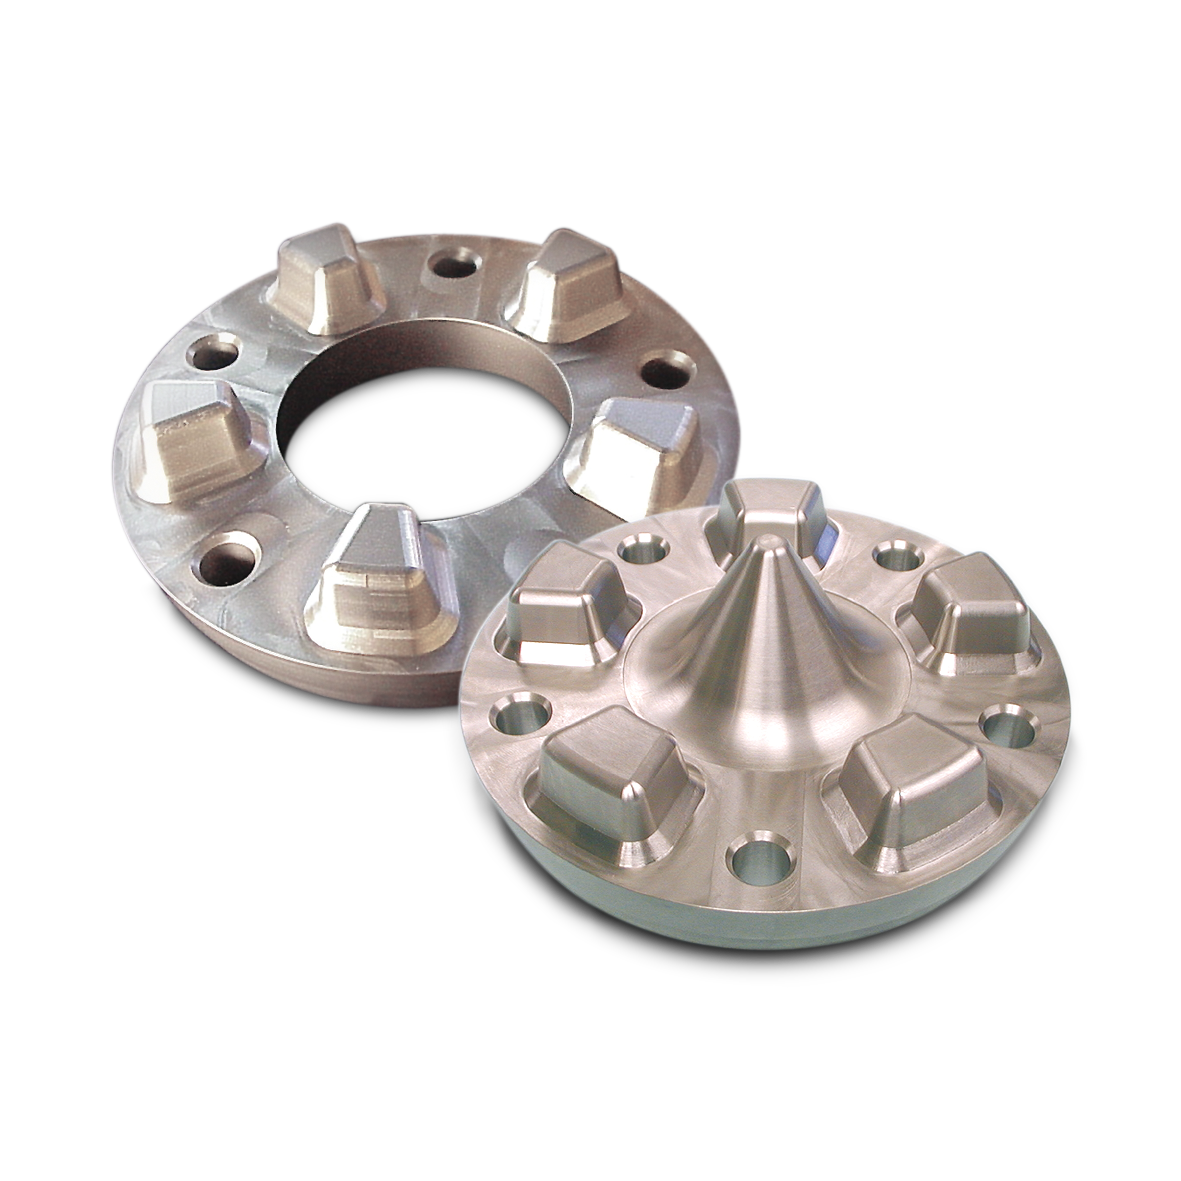 Densimet® and TZM inserts. For perfect aluminum casting.